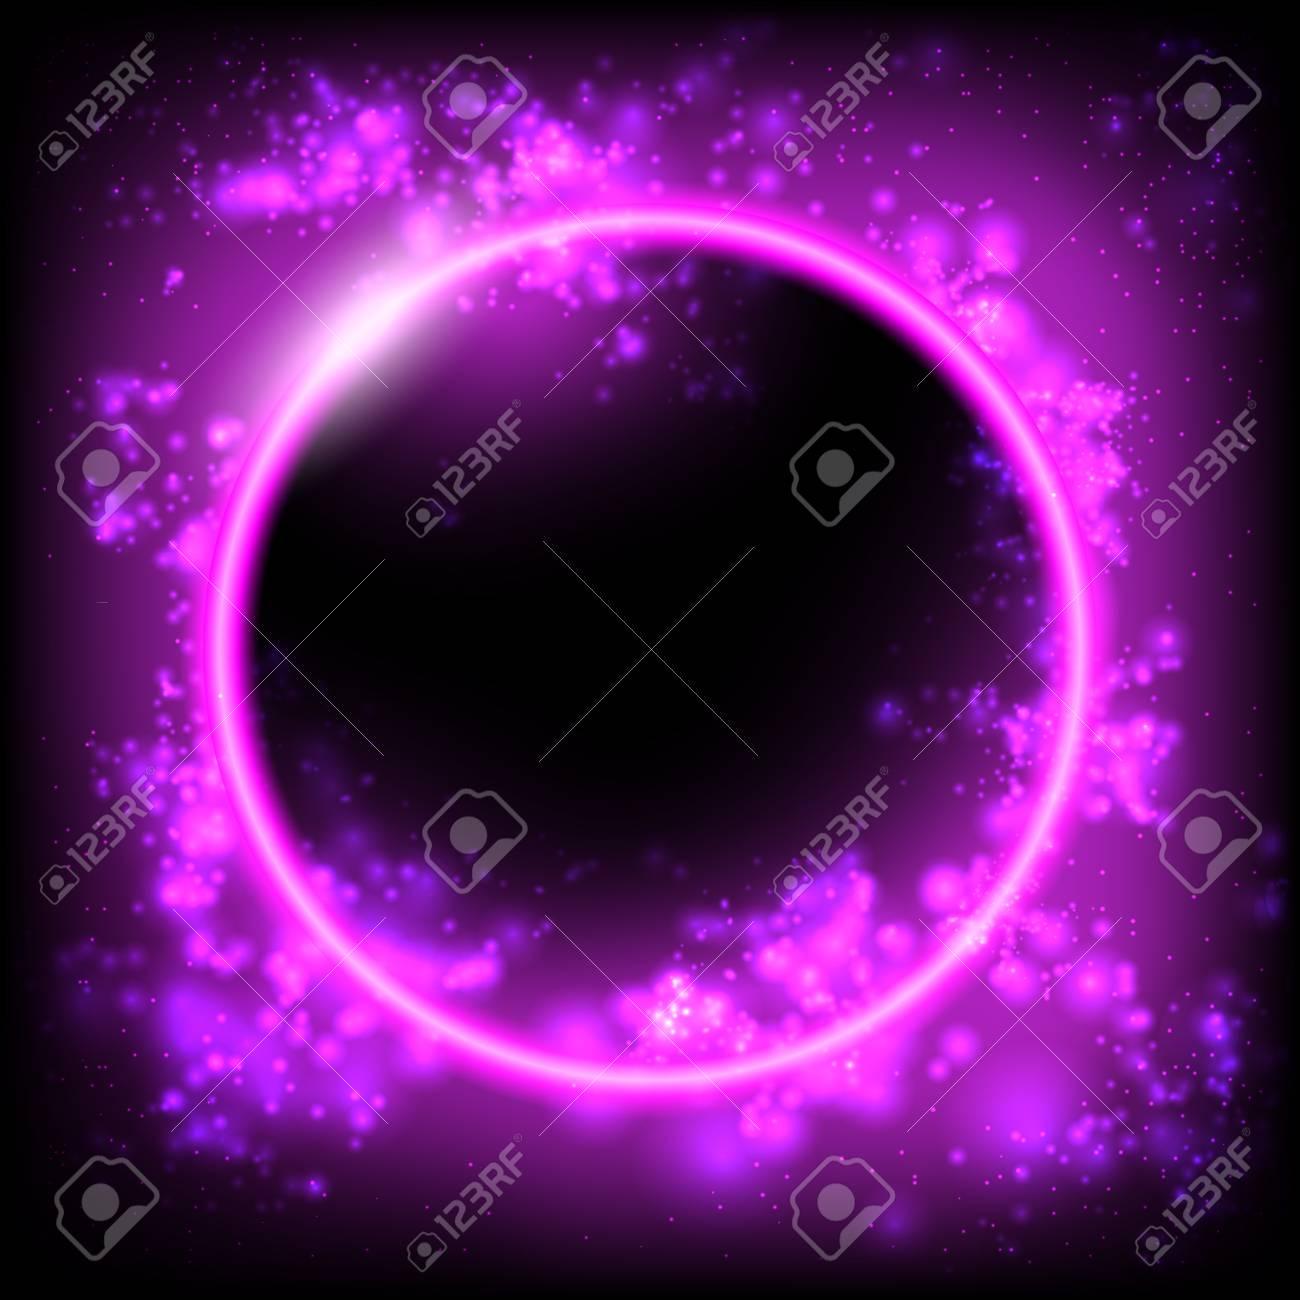 Space background  Planet, Black Hole, Solar eclipse  Futuristic